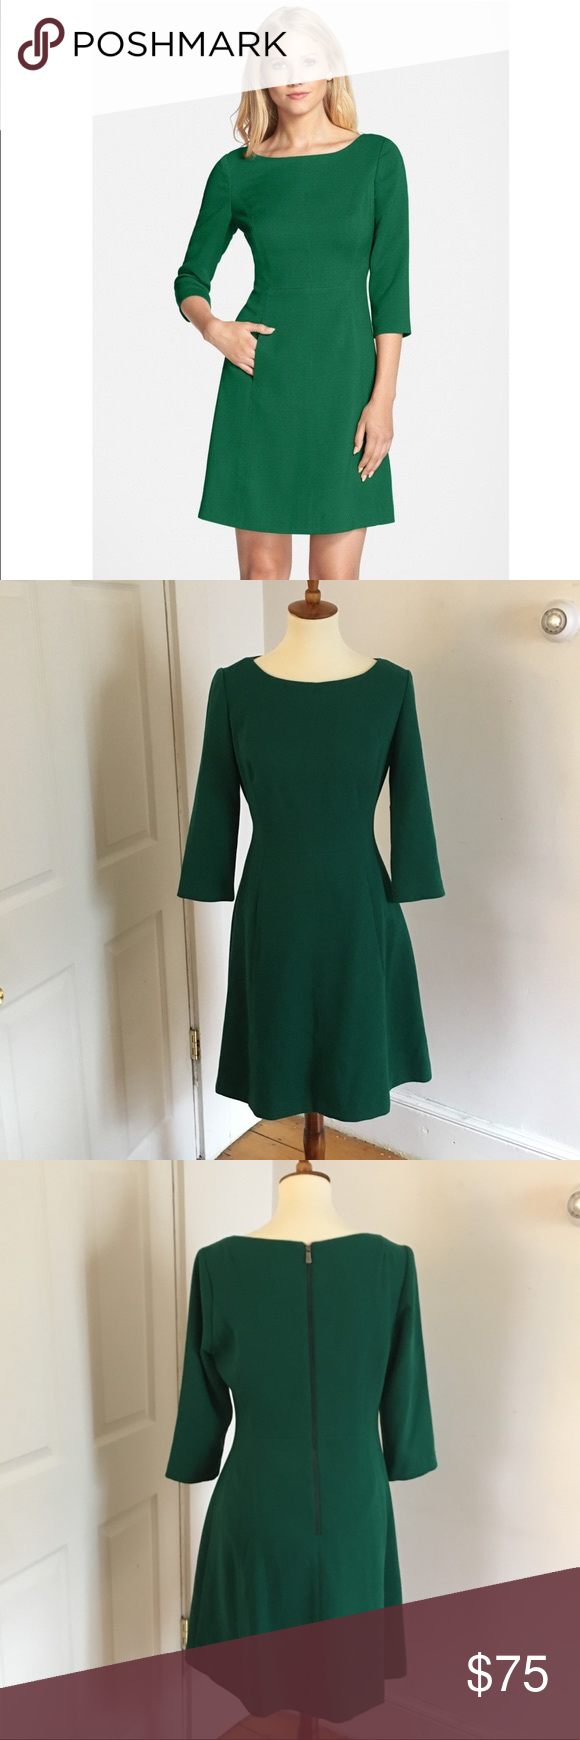 Hp Vince Camuto A Line Pocket Dress Dresses Pocket Dress A Line Dress [ 1740 x 580 Pixel ]